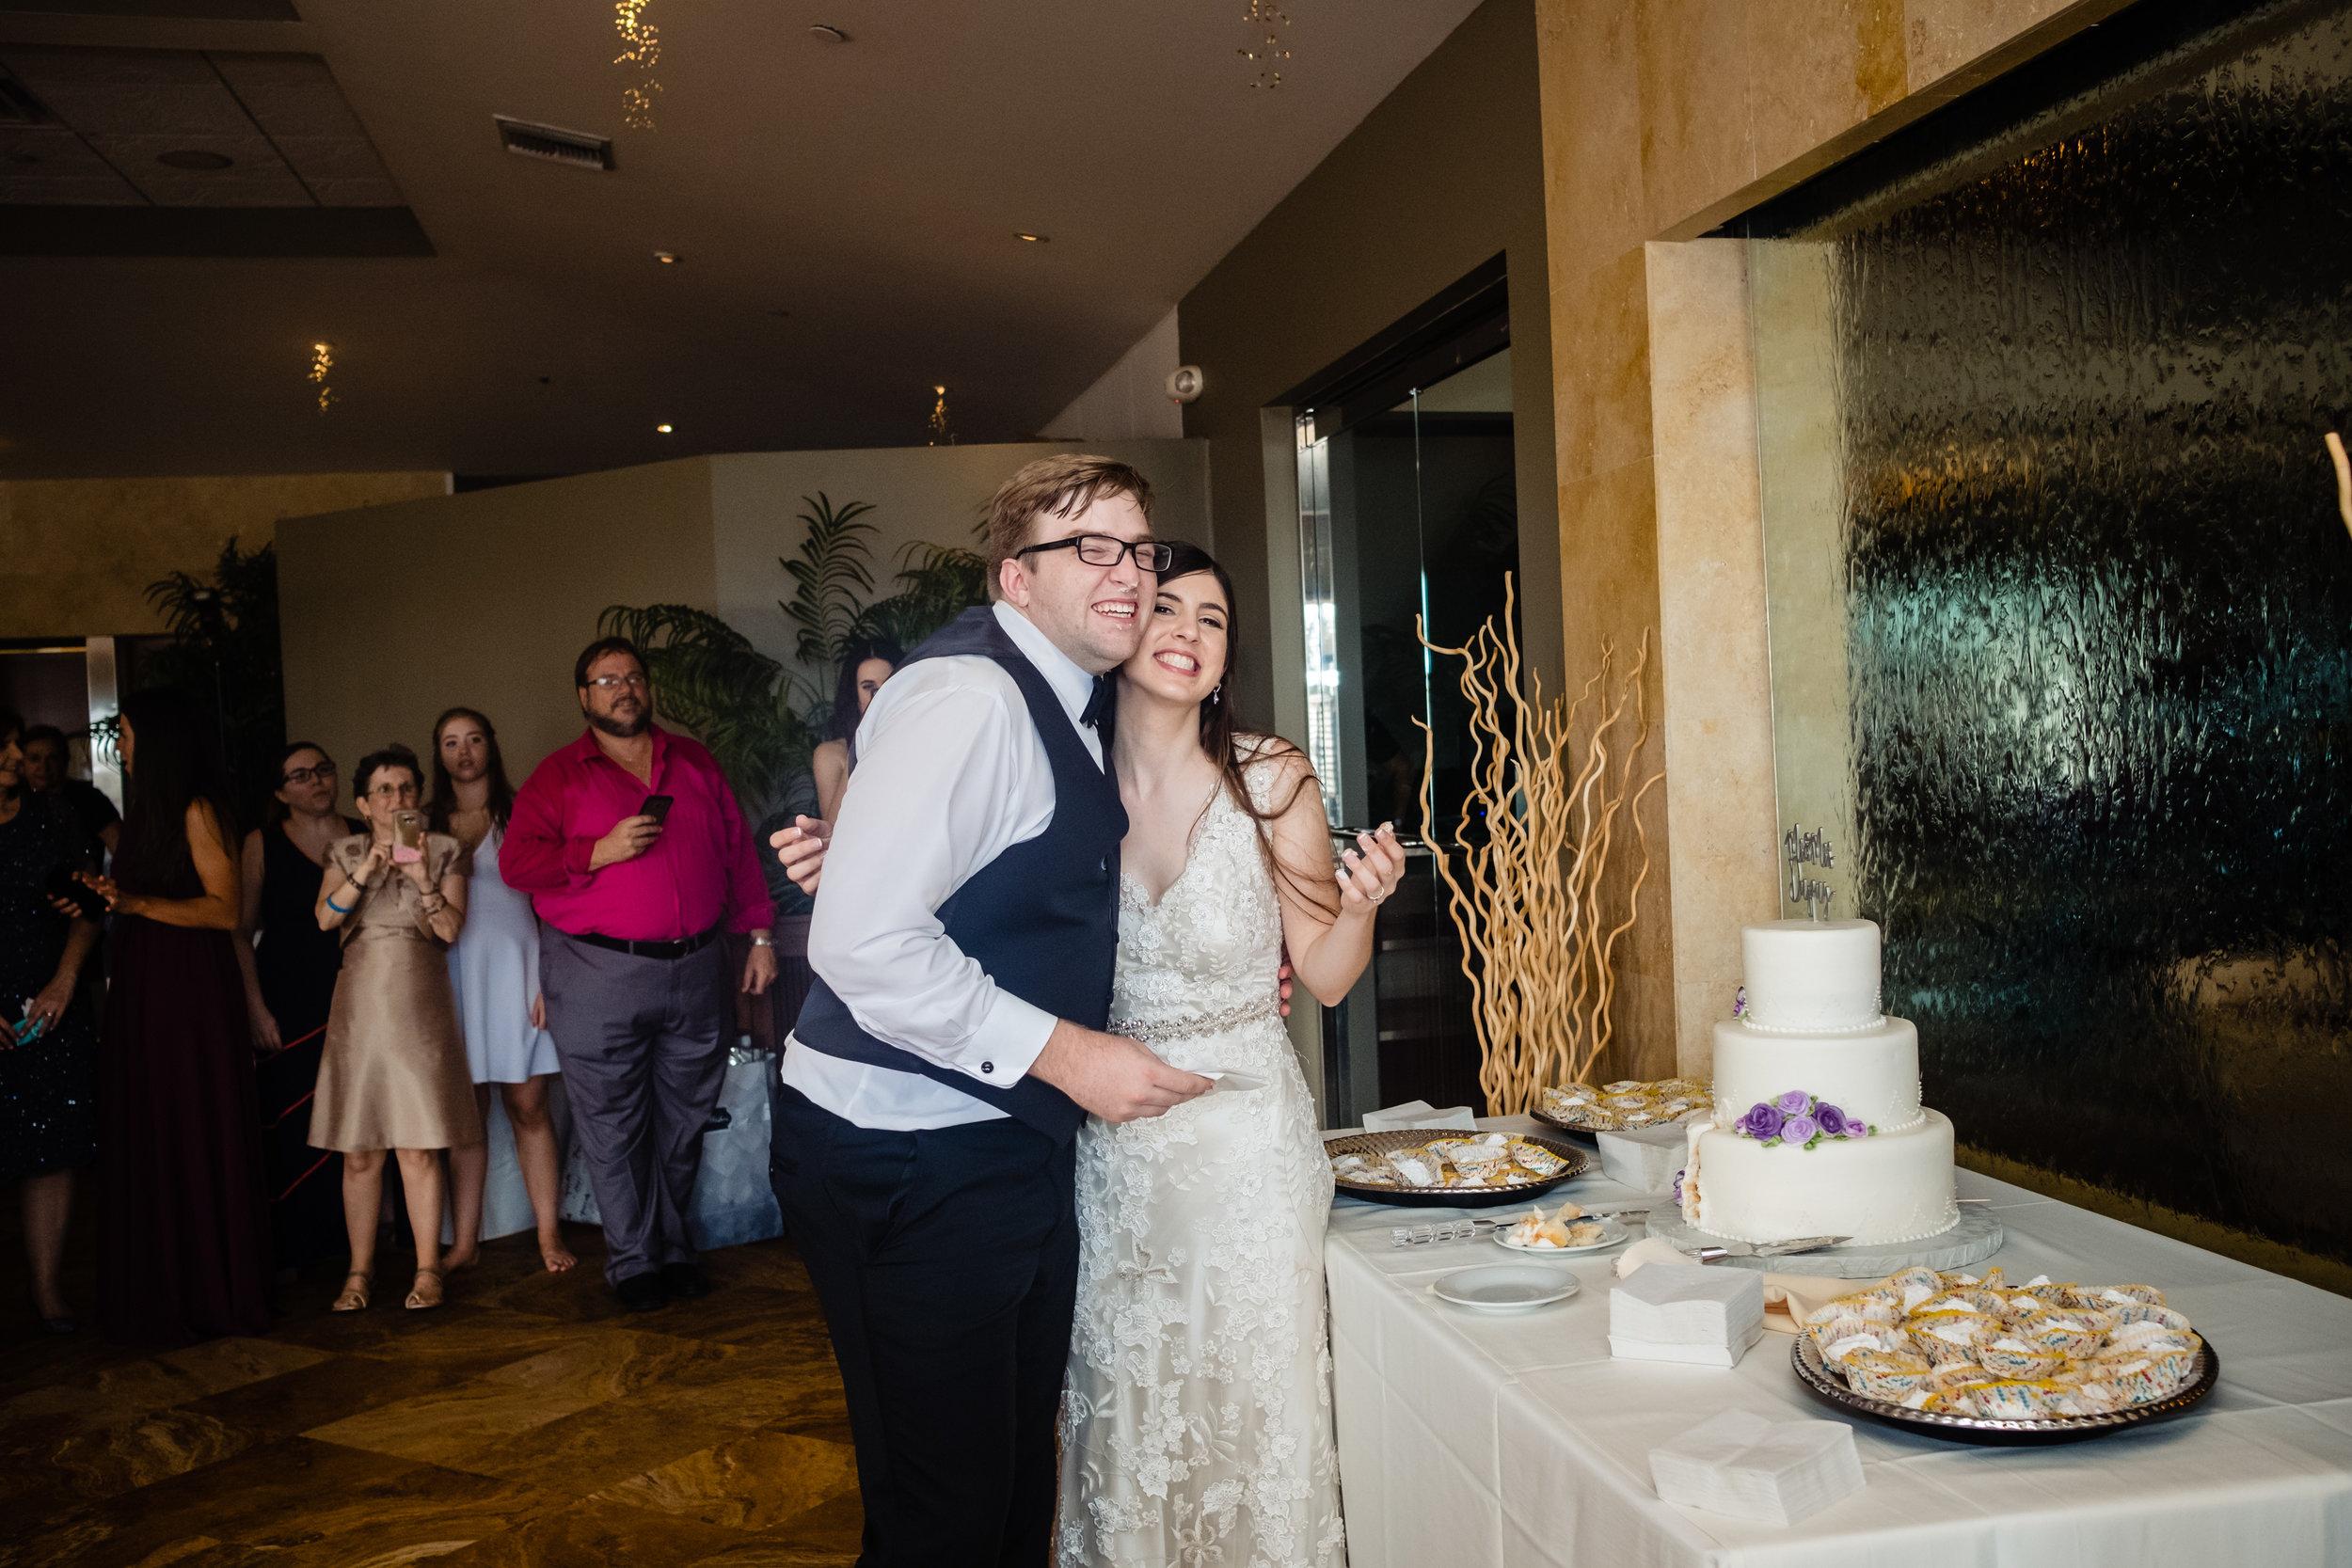 HAH_Zoe and Daniel_Clearwater Wedding_673_2018.jpg